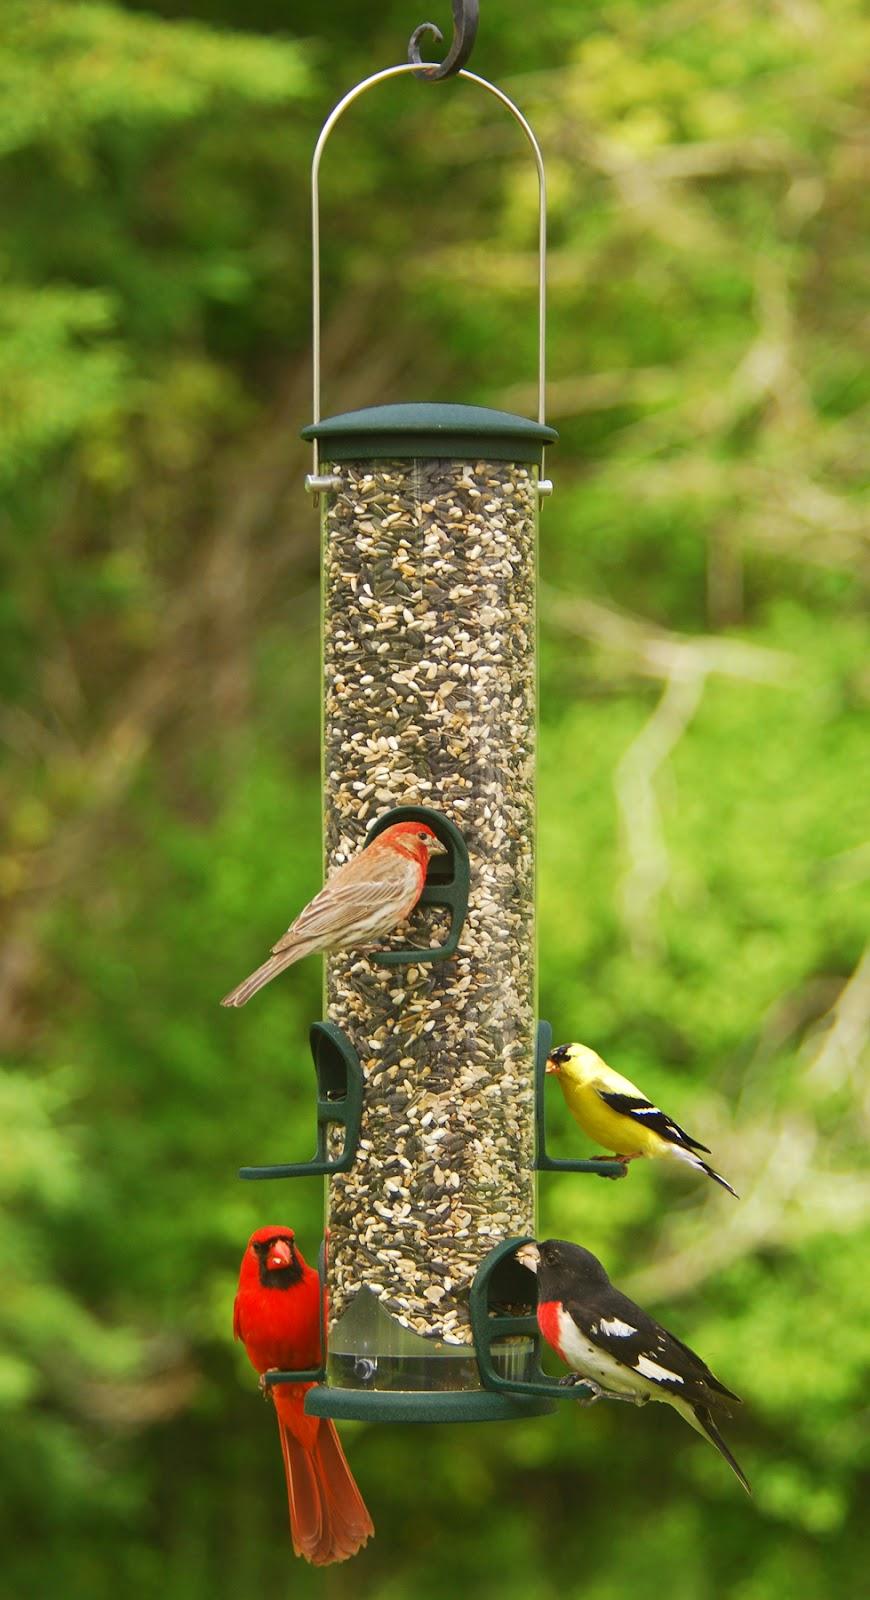 Wild Birds Unlimited: Choosing The Best Bird Seed